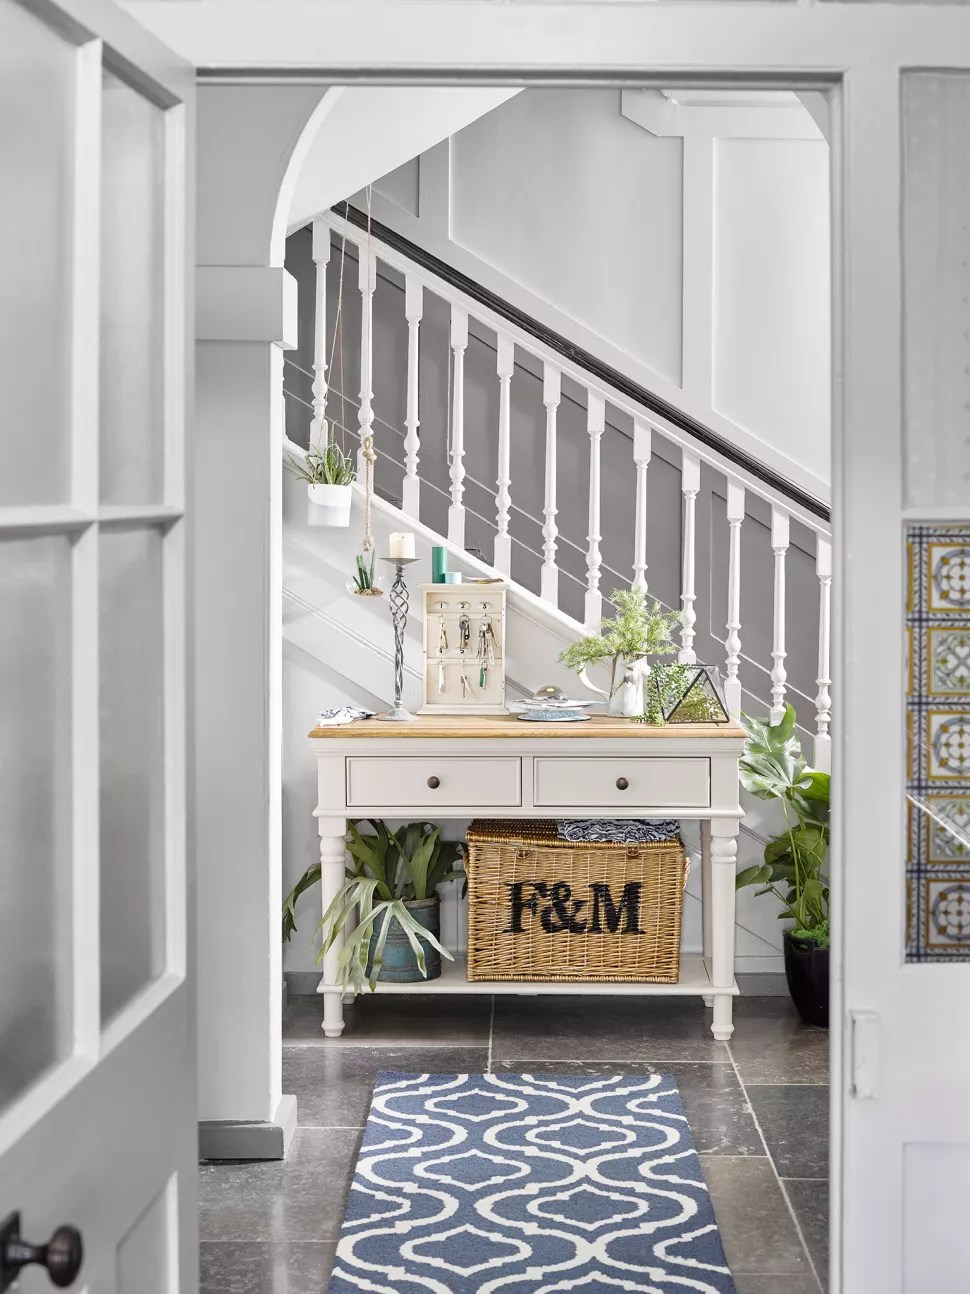 small hallway idea with a runner rug